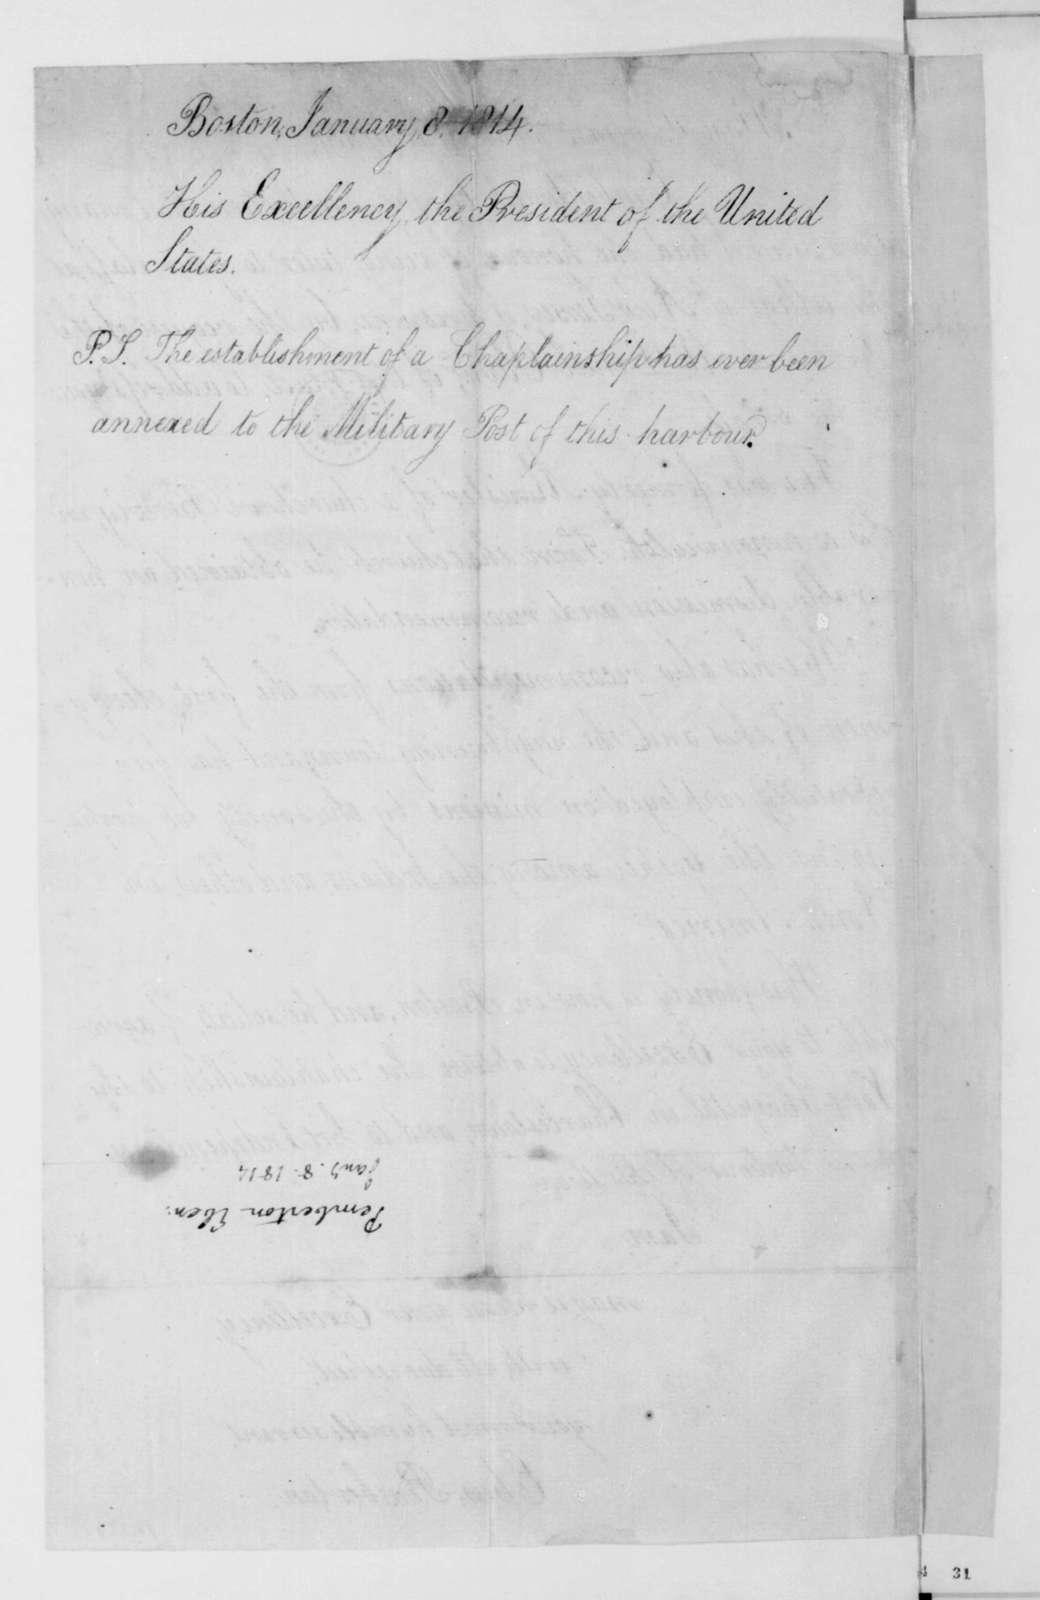 Ebenezar Pemberton to James Madison, January 8, 1814.